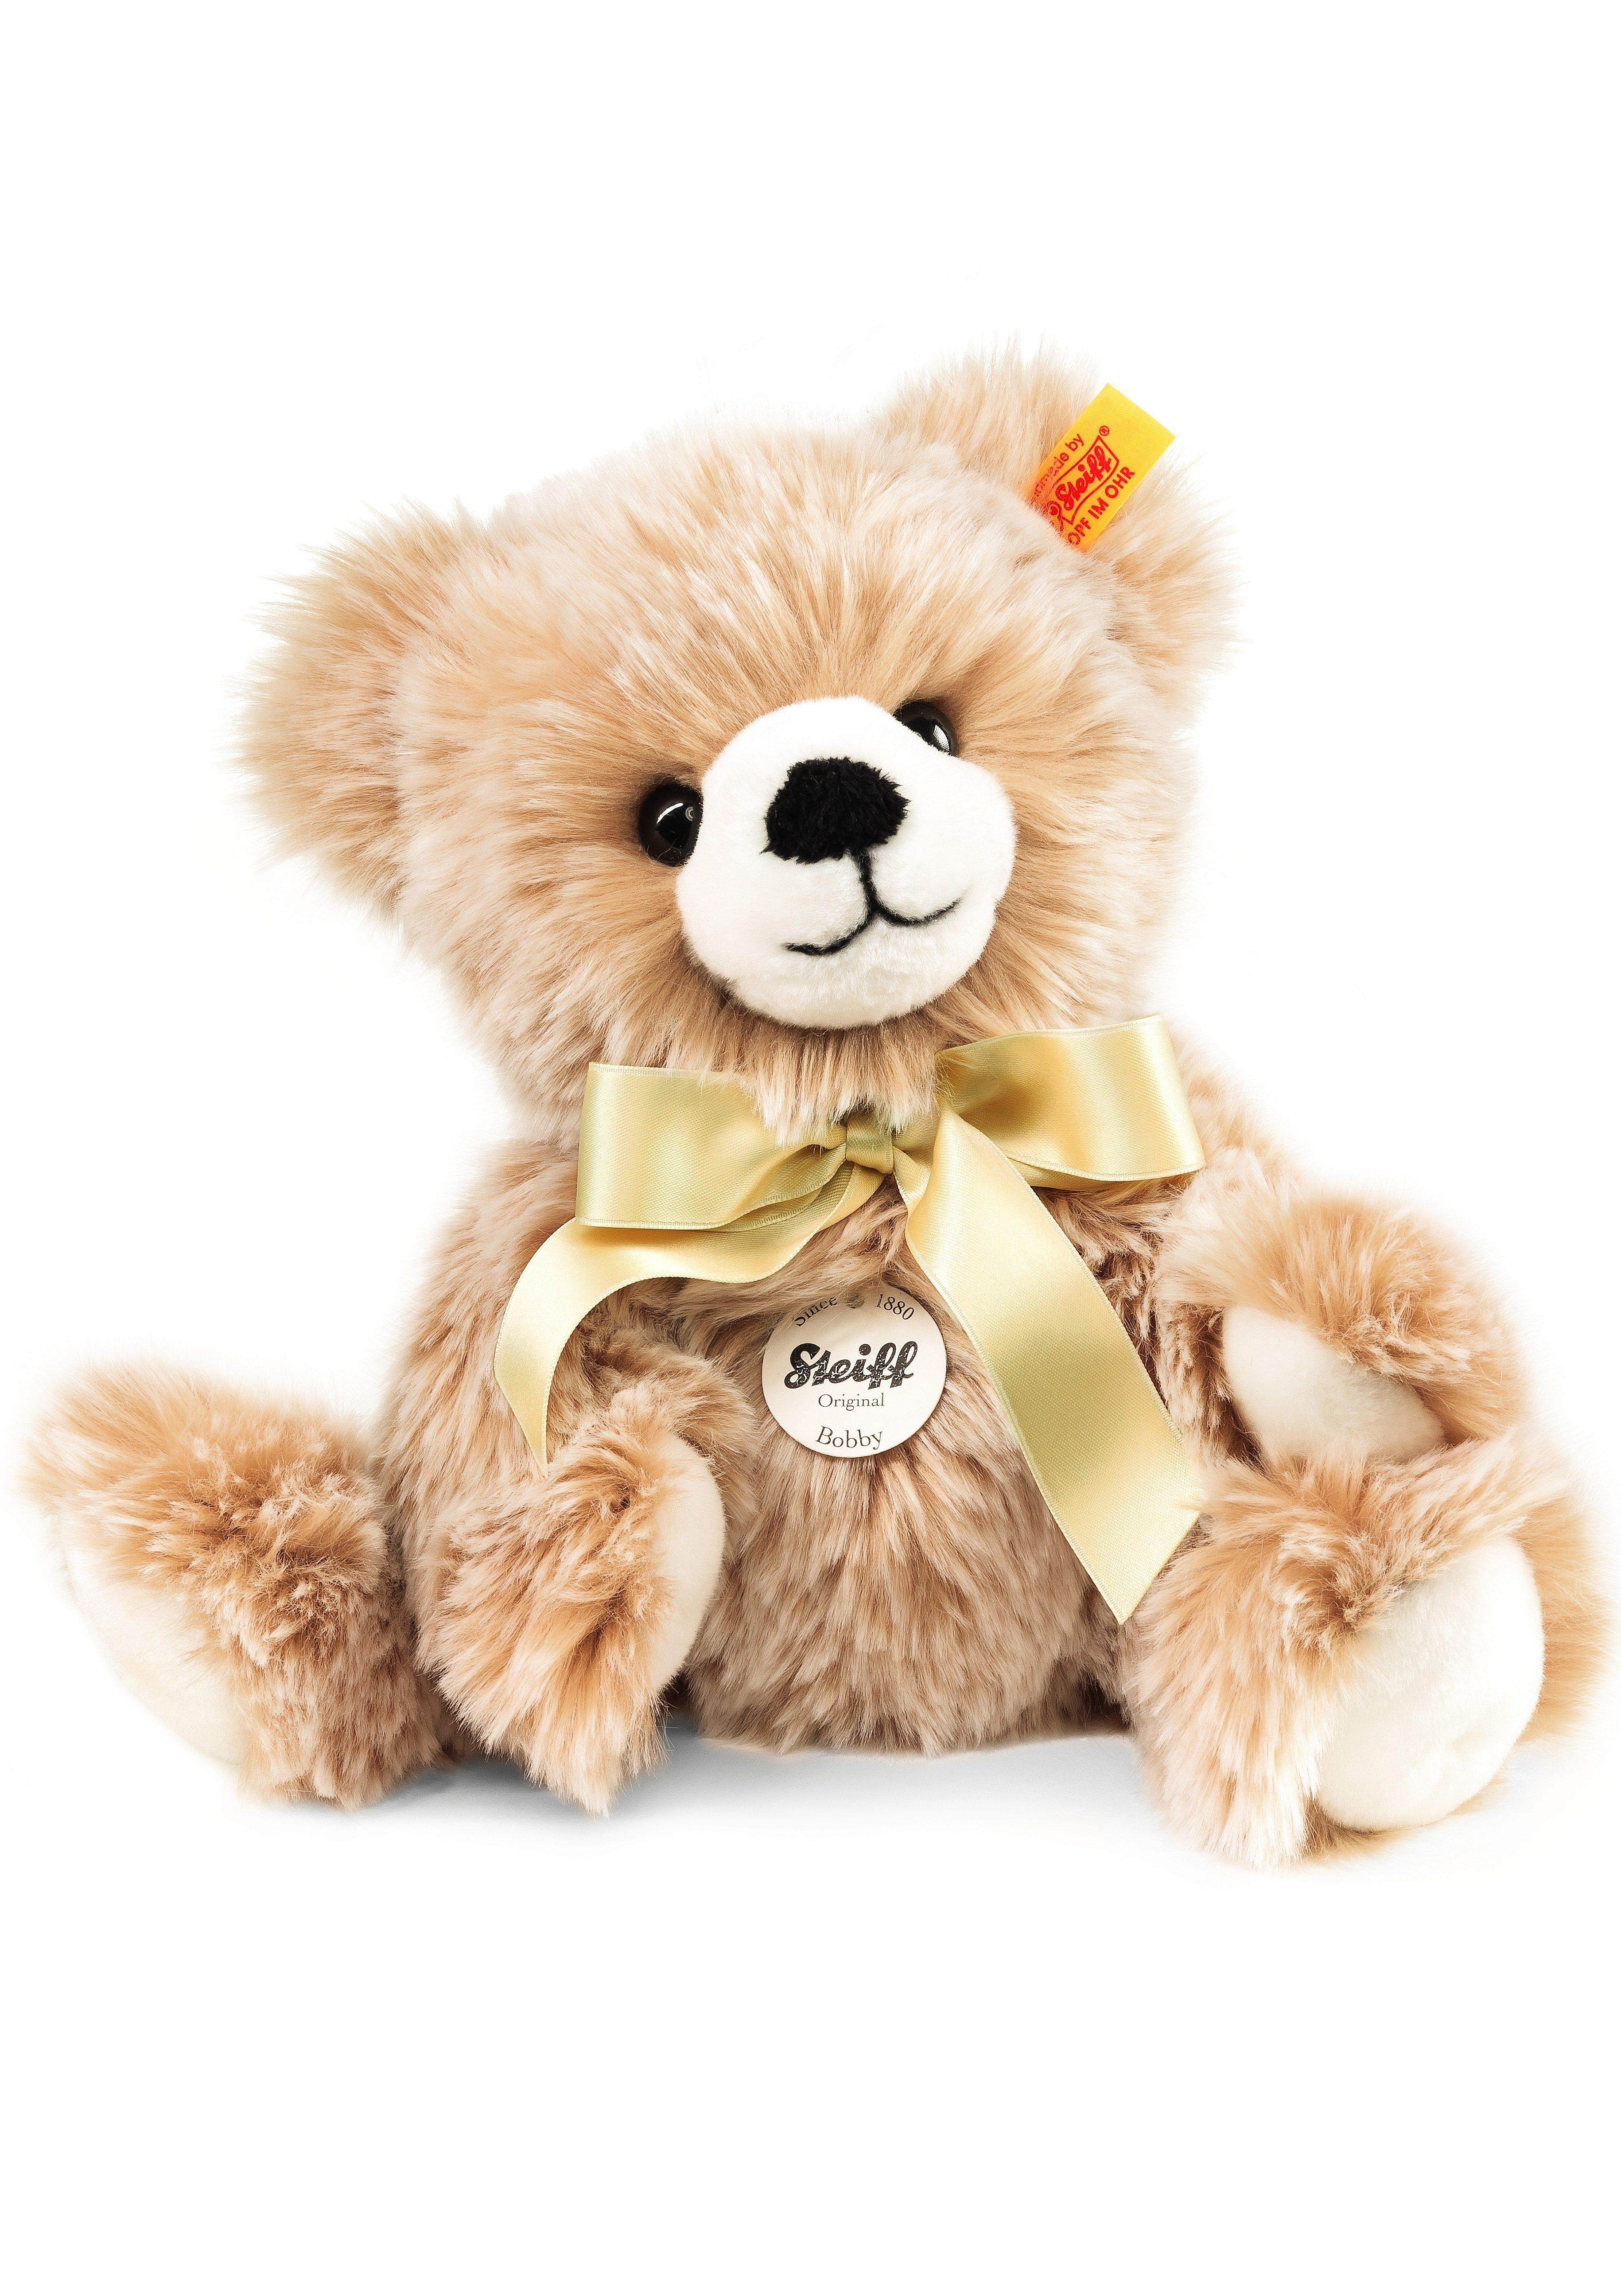 Steiff Plüschtier, 30 cm, »Bobby Schlenker-Teddybär«